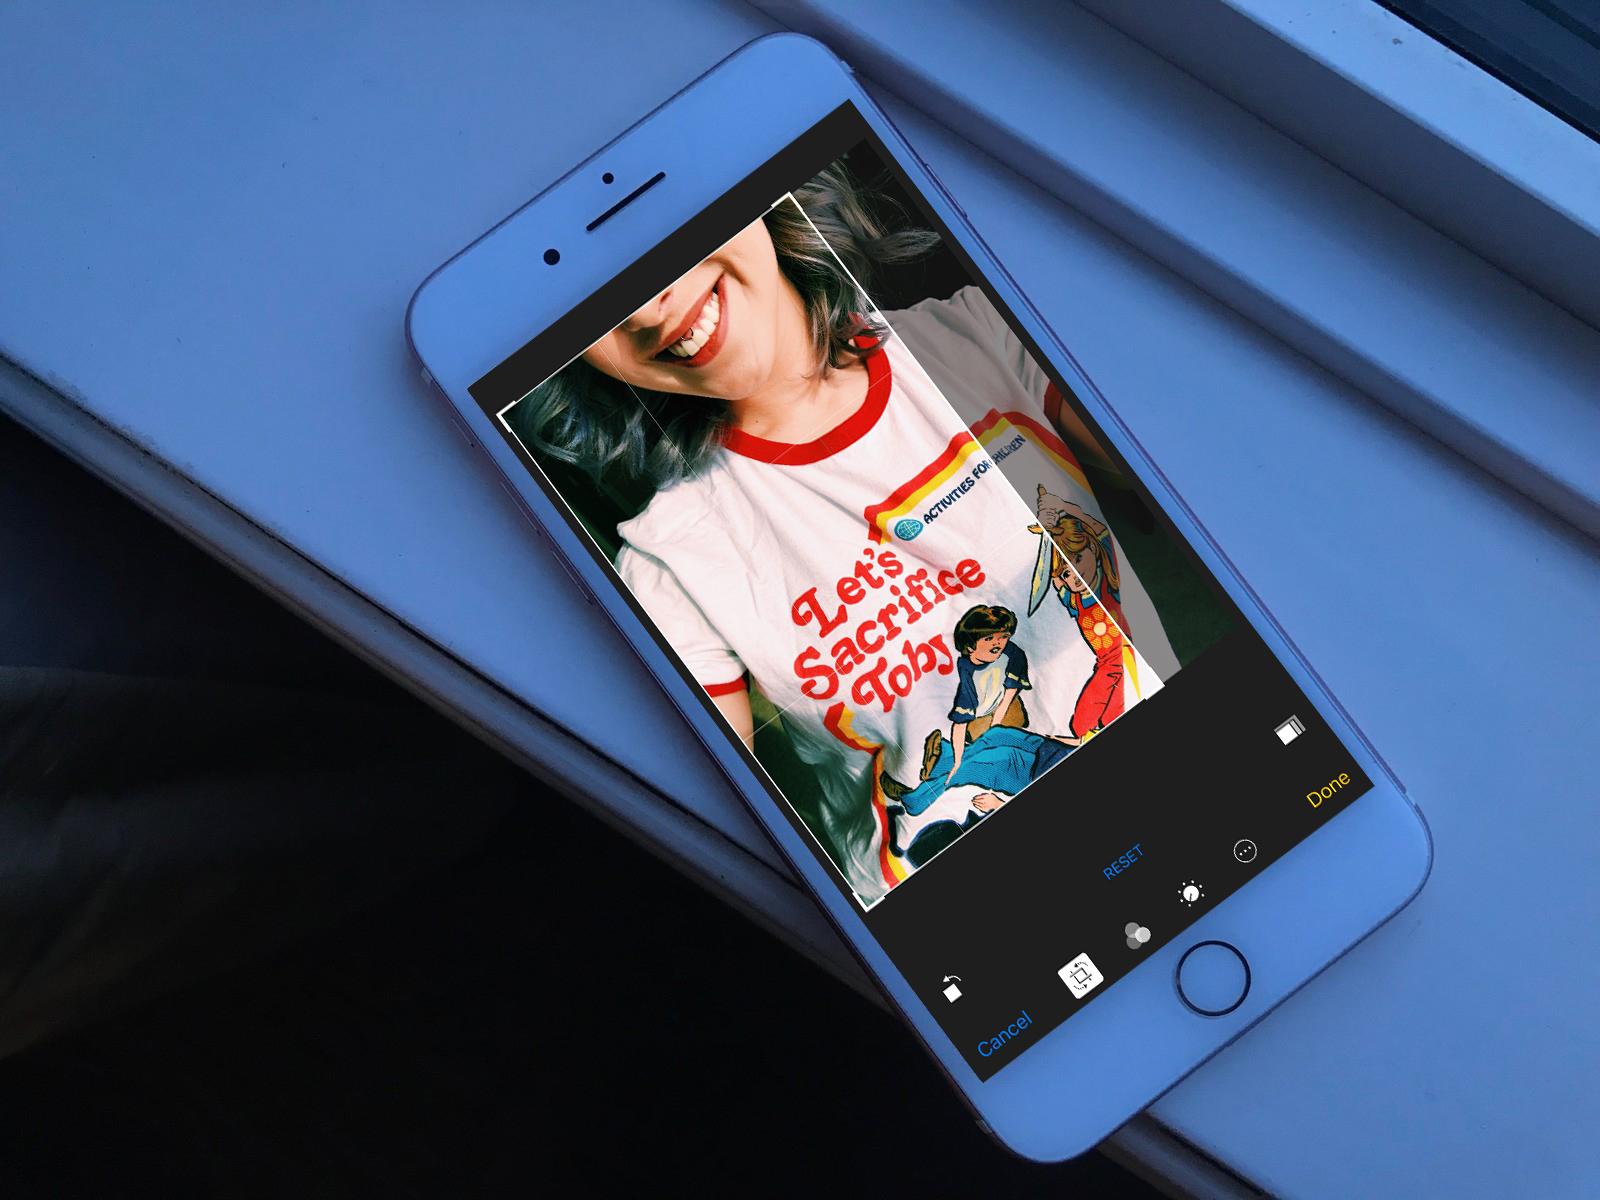 Iphone Wallpaper Size Editor   Iphone Wallpaper